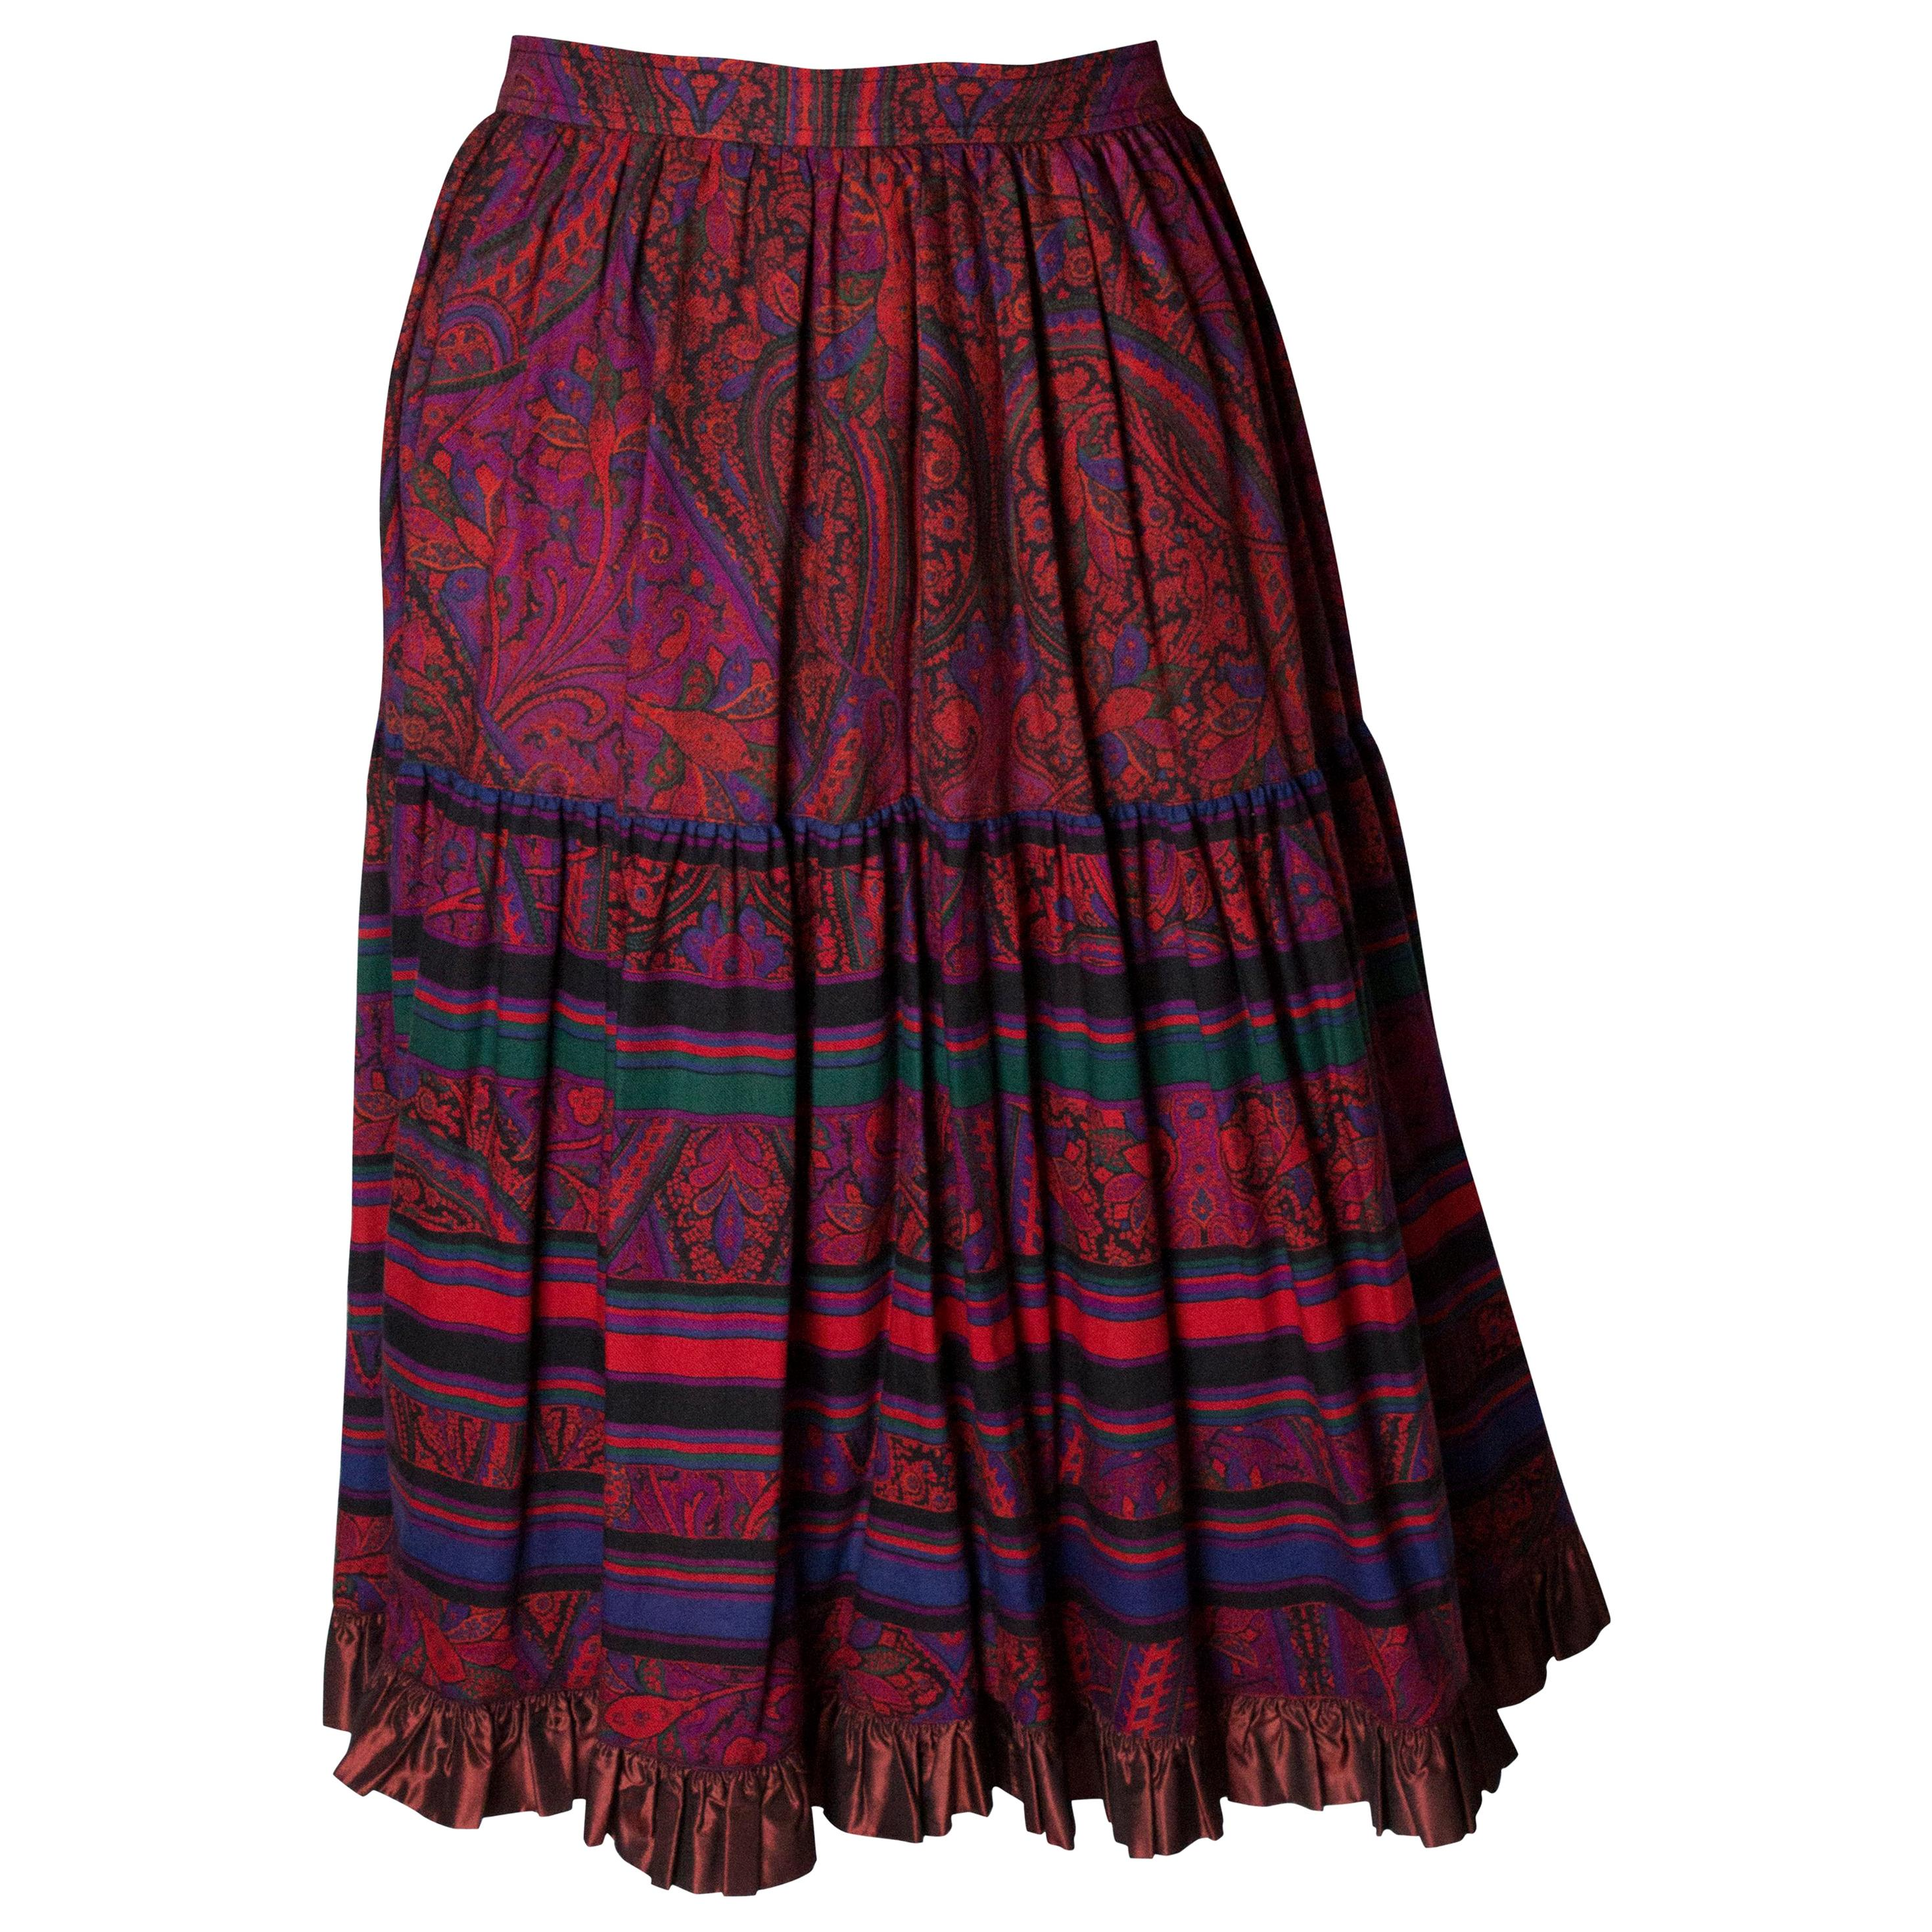 bca45d204 Vintage Yves Saint Laurent Skirts - 149 For Sale at 1stdibs